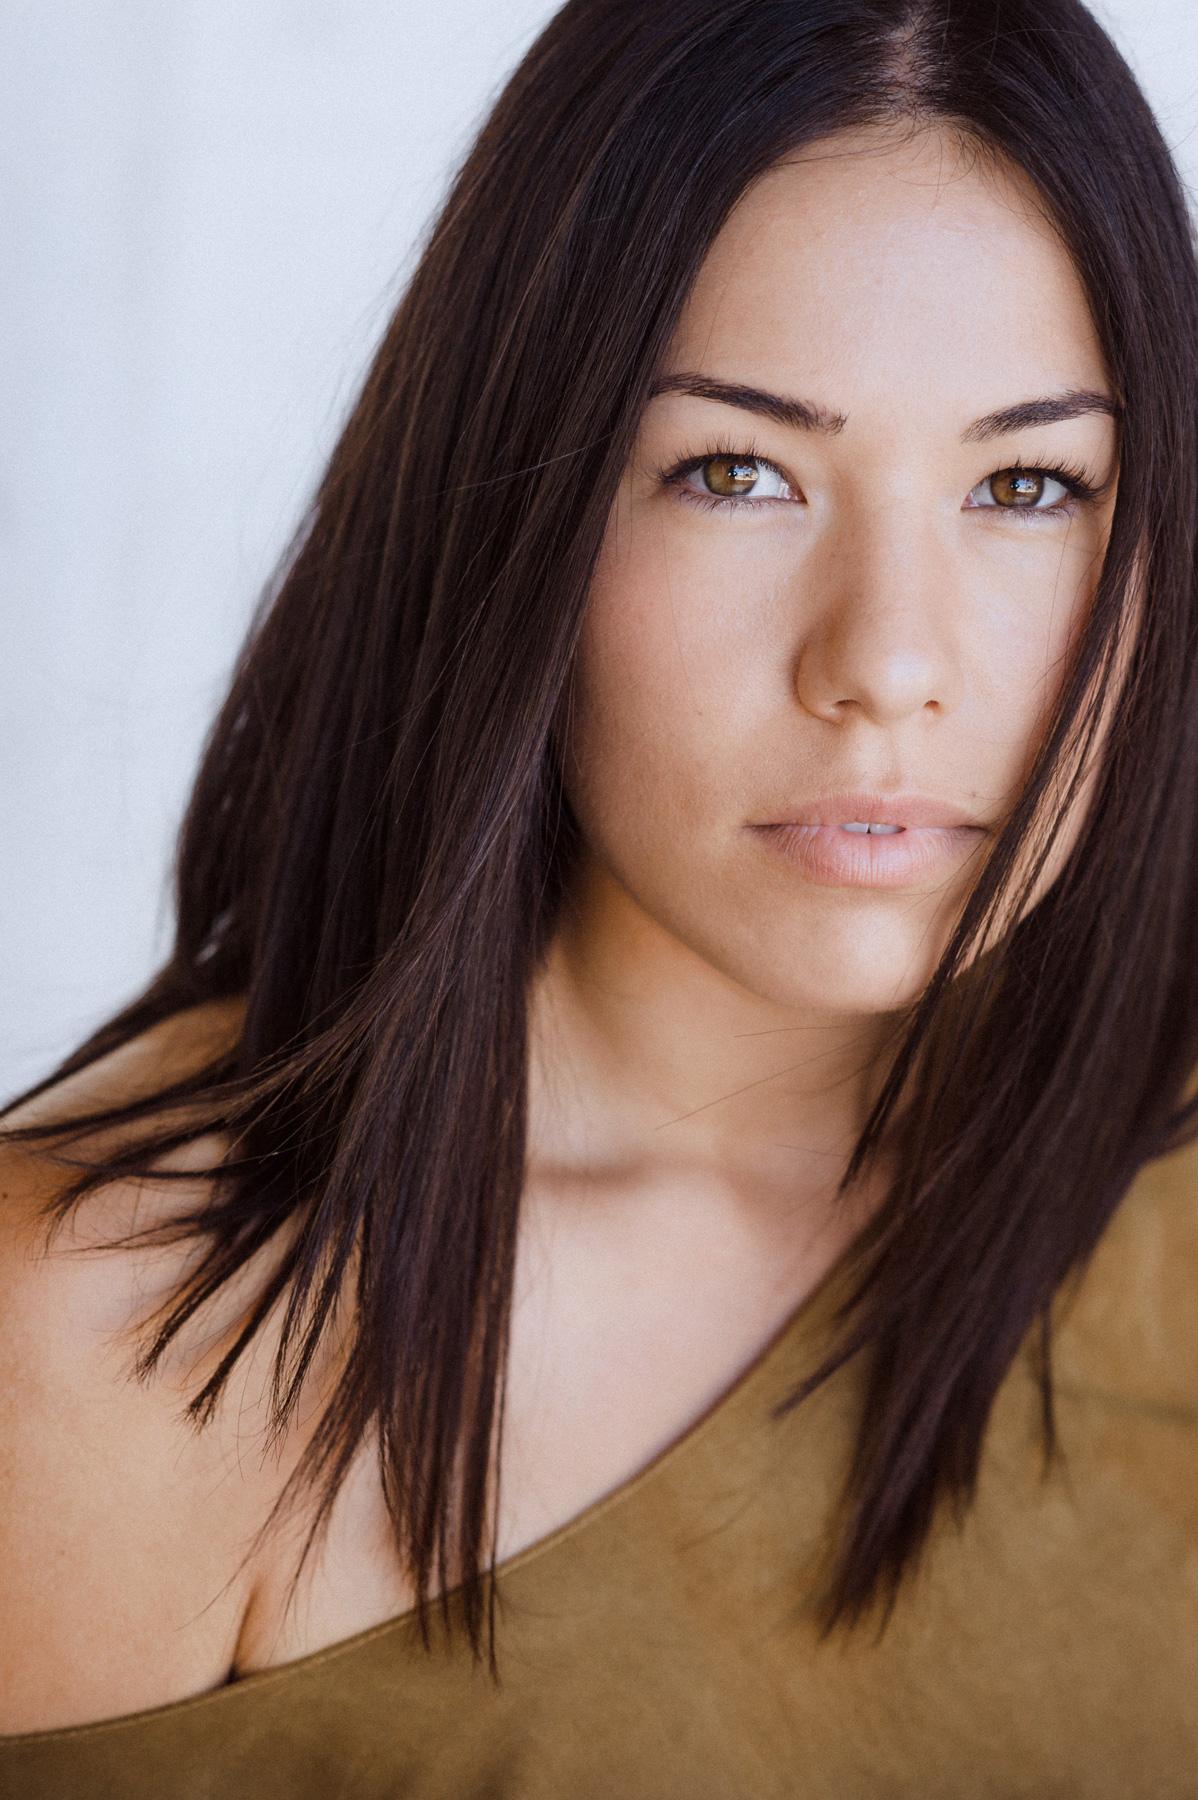 buddhist single women in choctaw Asian dating in oklahoma city  letstravel (33)asian dating in oklahoma city buddhist asian woman i  asian dating in spencer (ok) asian dating in choctaw (ok.